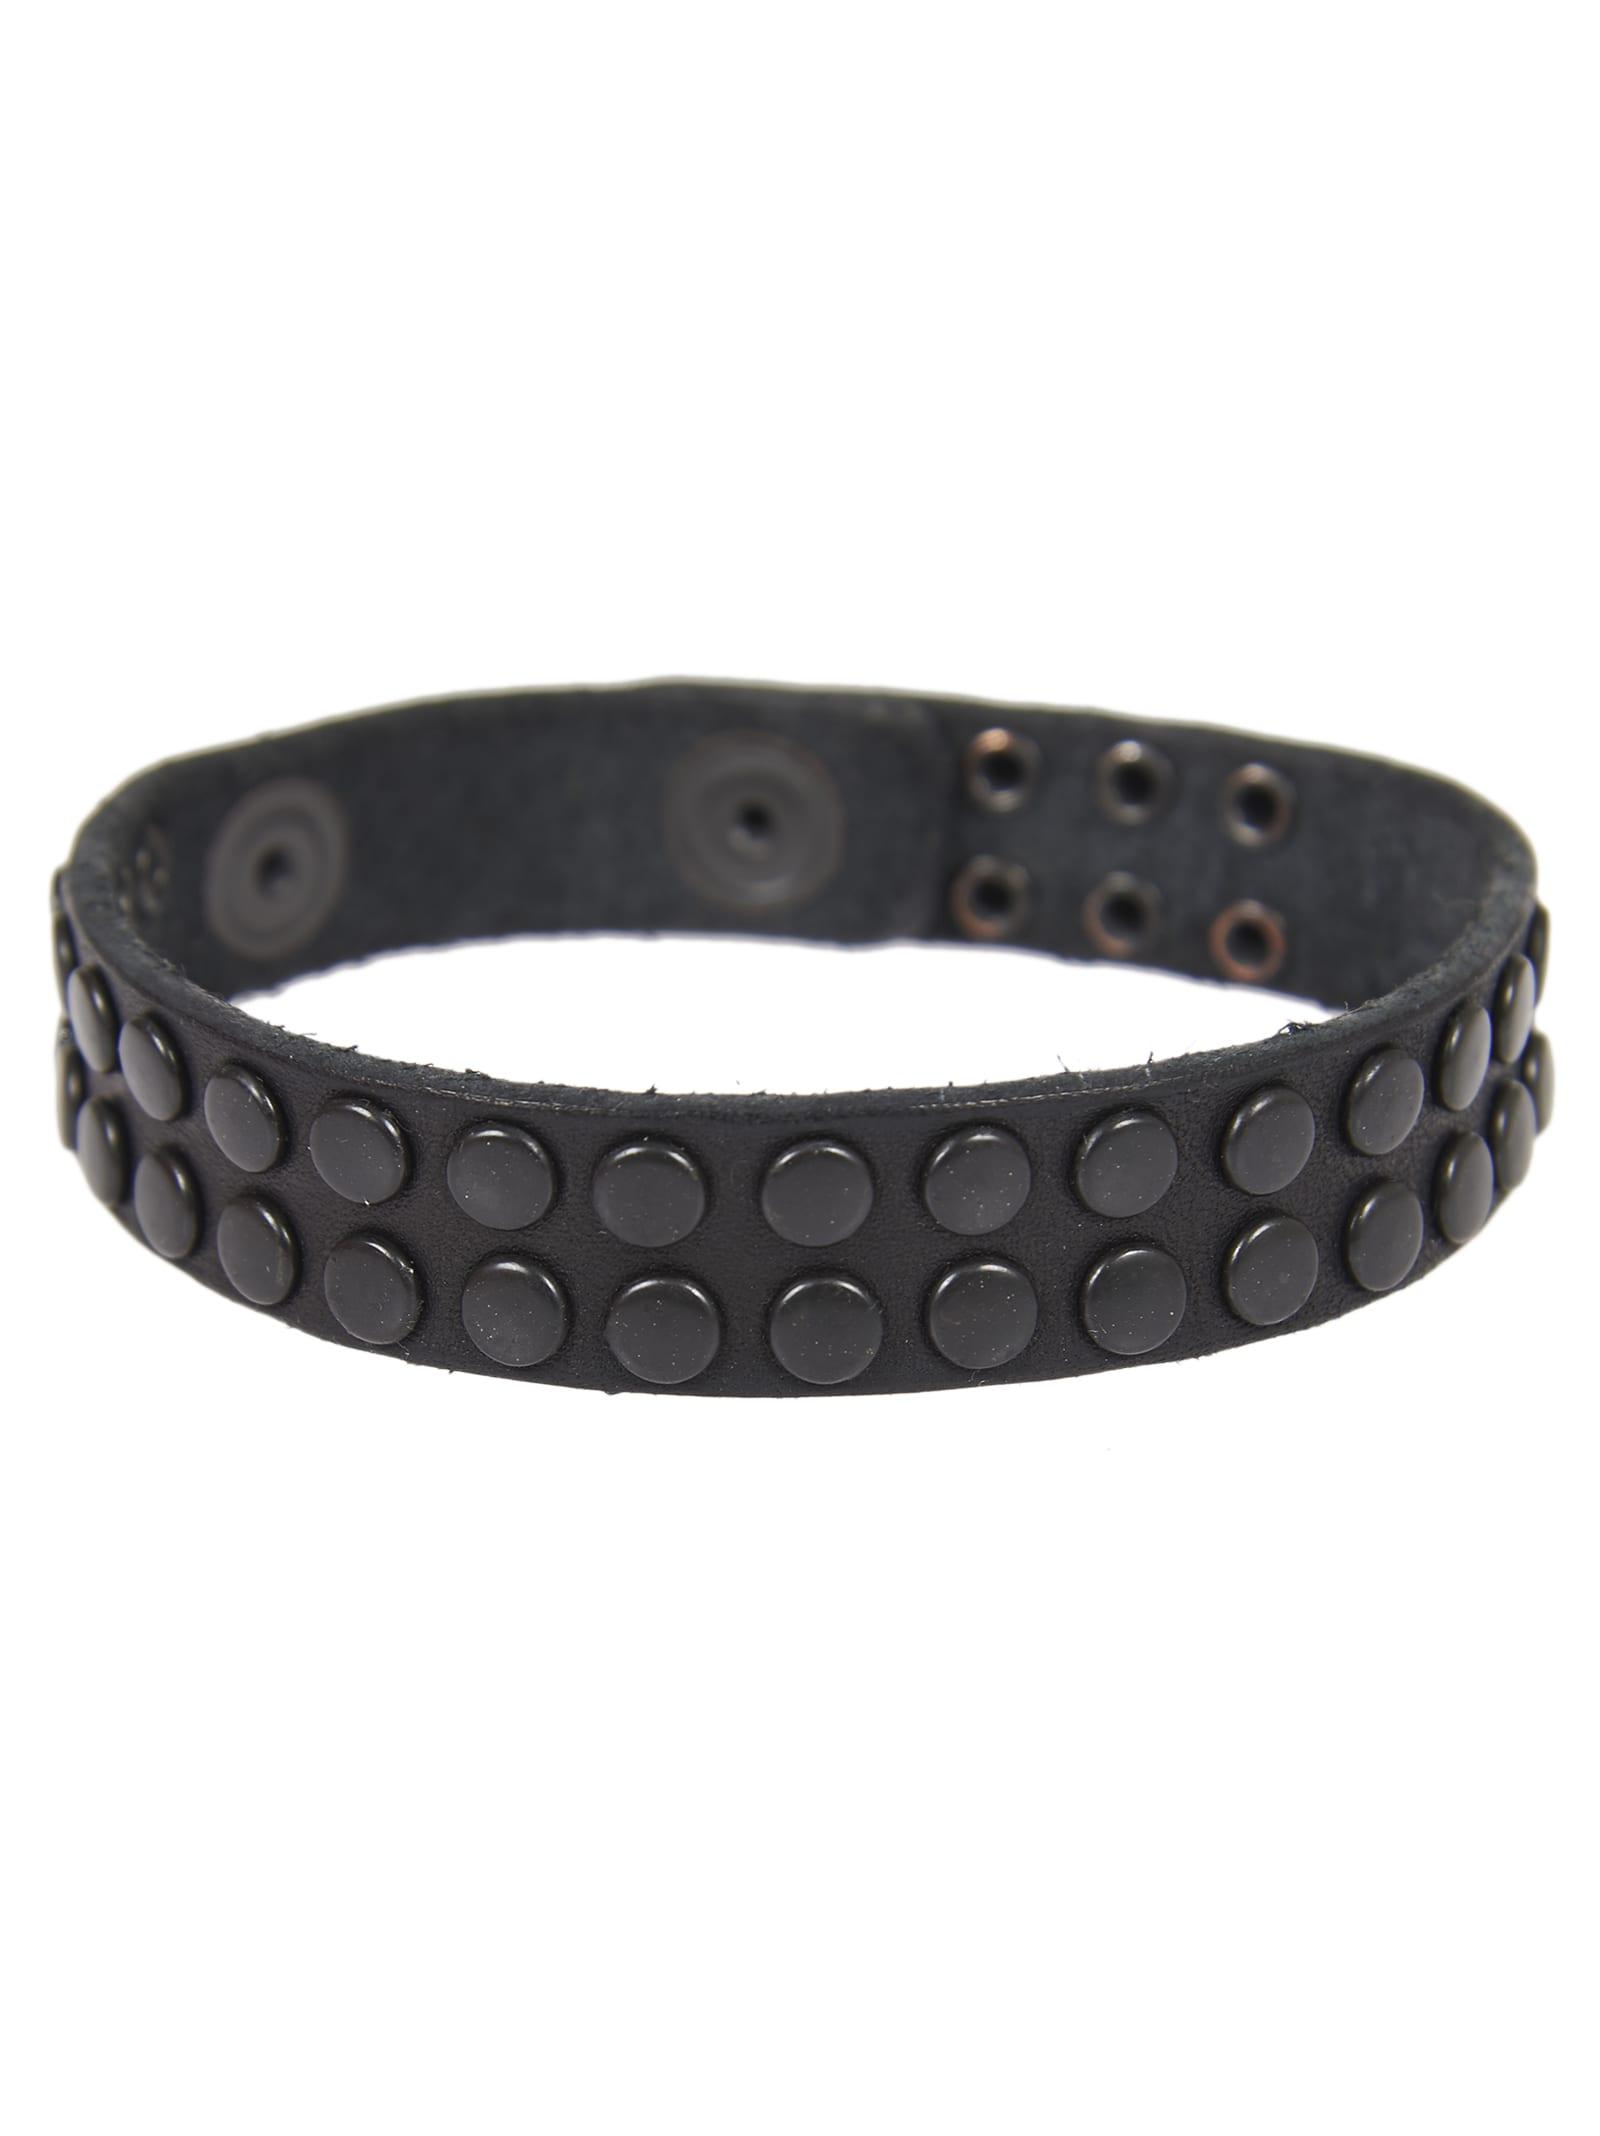 Black Bracelet With Studs